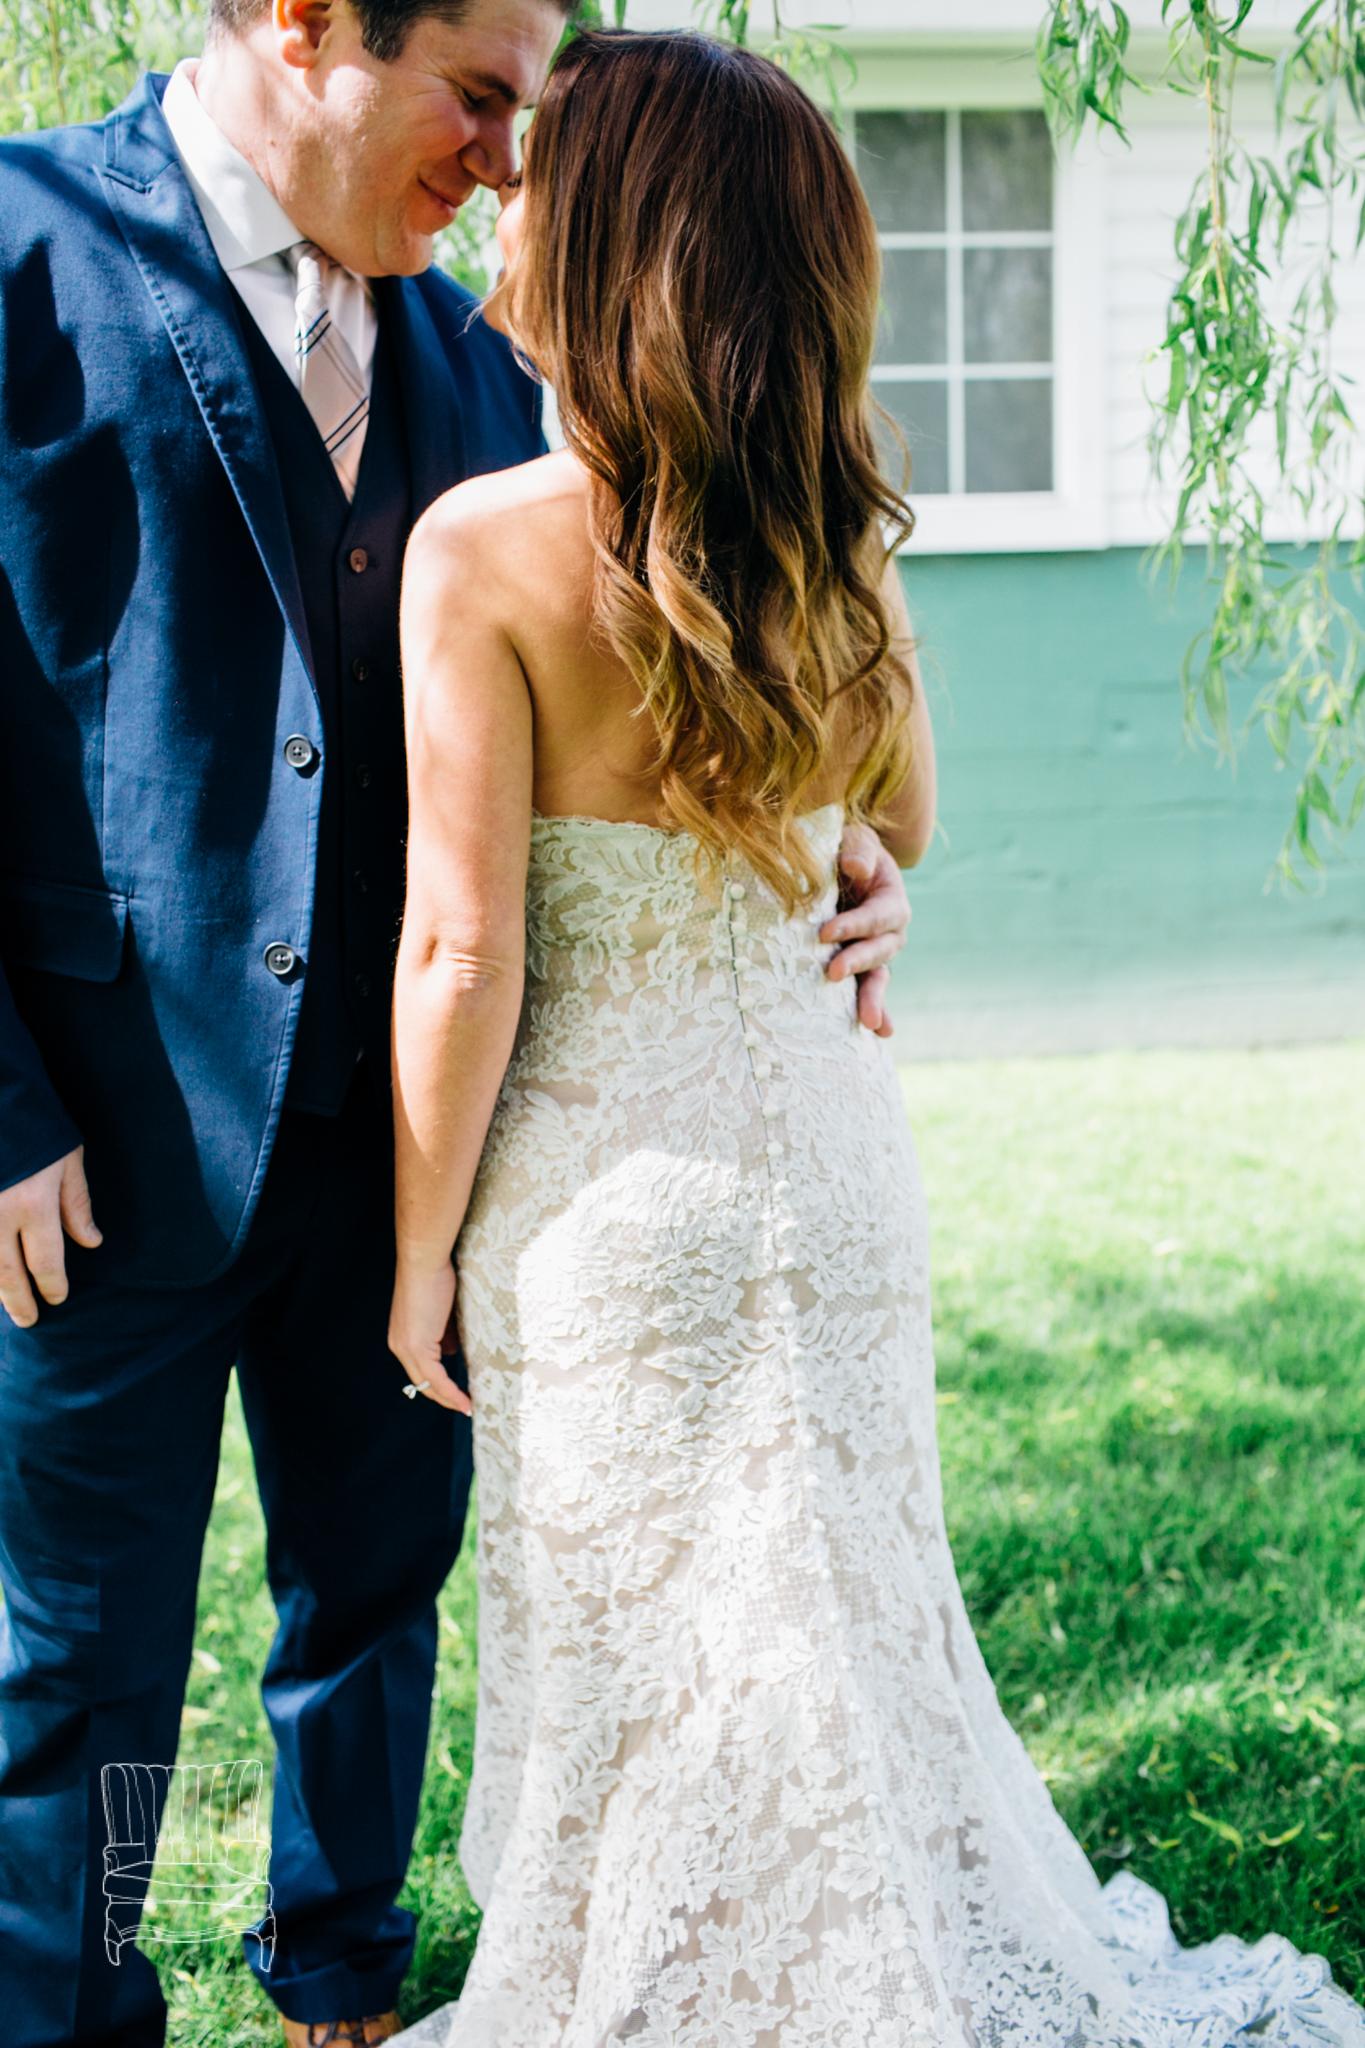 seattle-wedding-photographer-katheryn-moran-russells-bothell-wilkins-wedding-photo-20.jpg